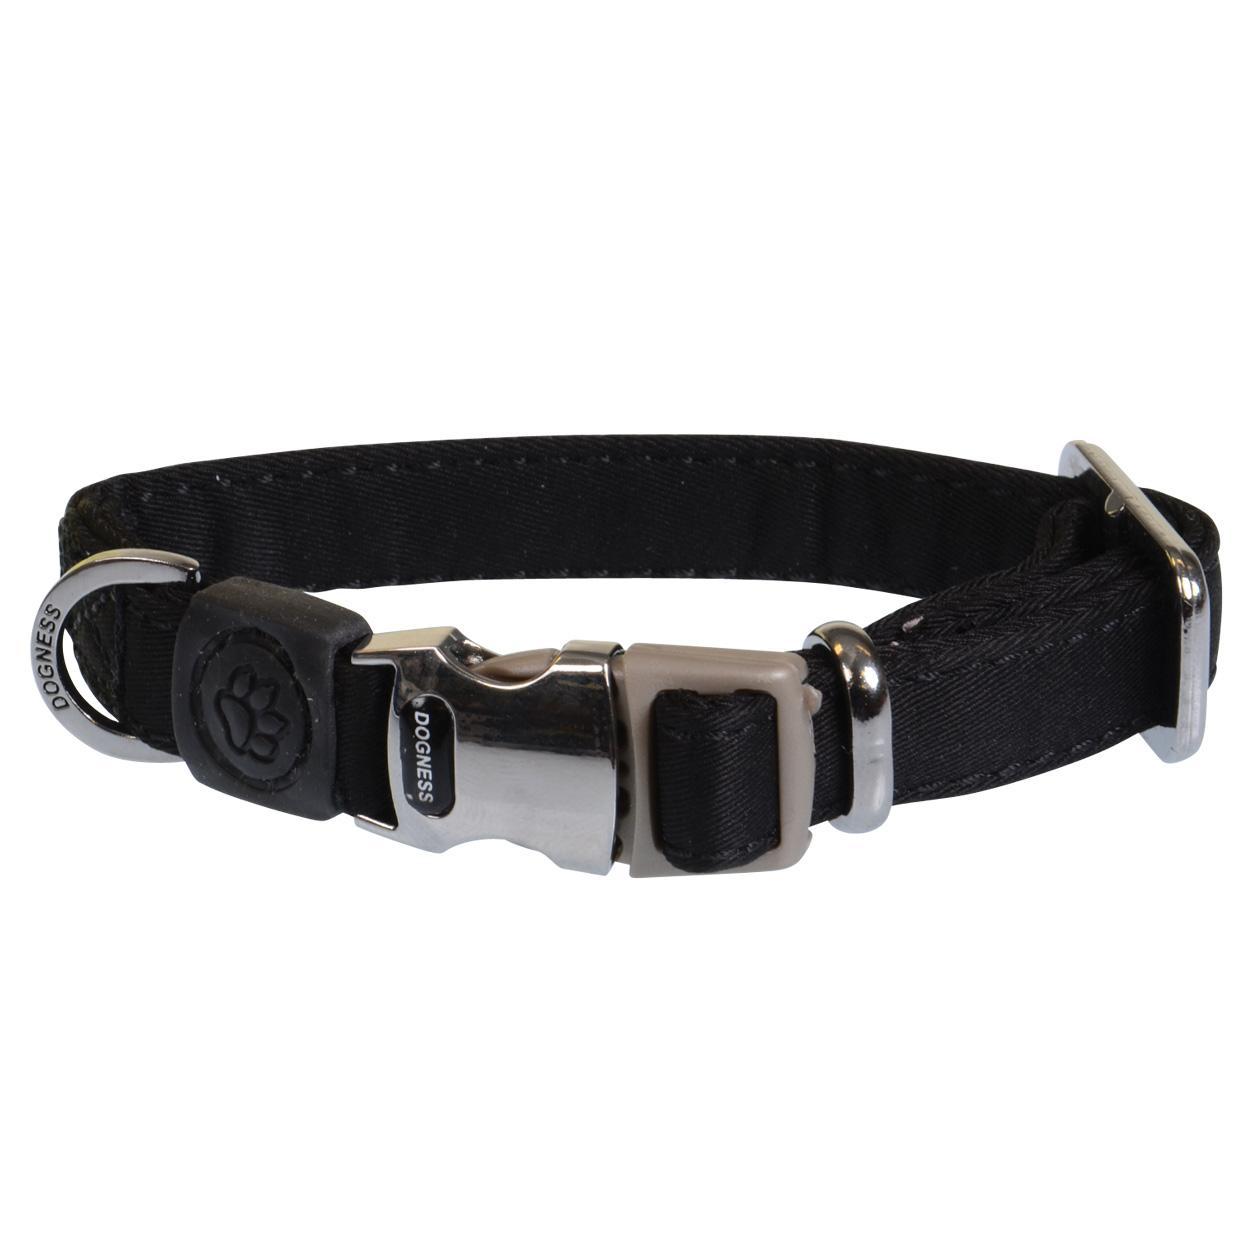 "Dogness Teflon Collar - Black - X-Small - 1/2"" (6"" to 10"" neck) 30911"